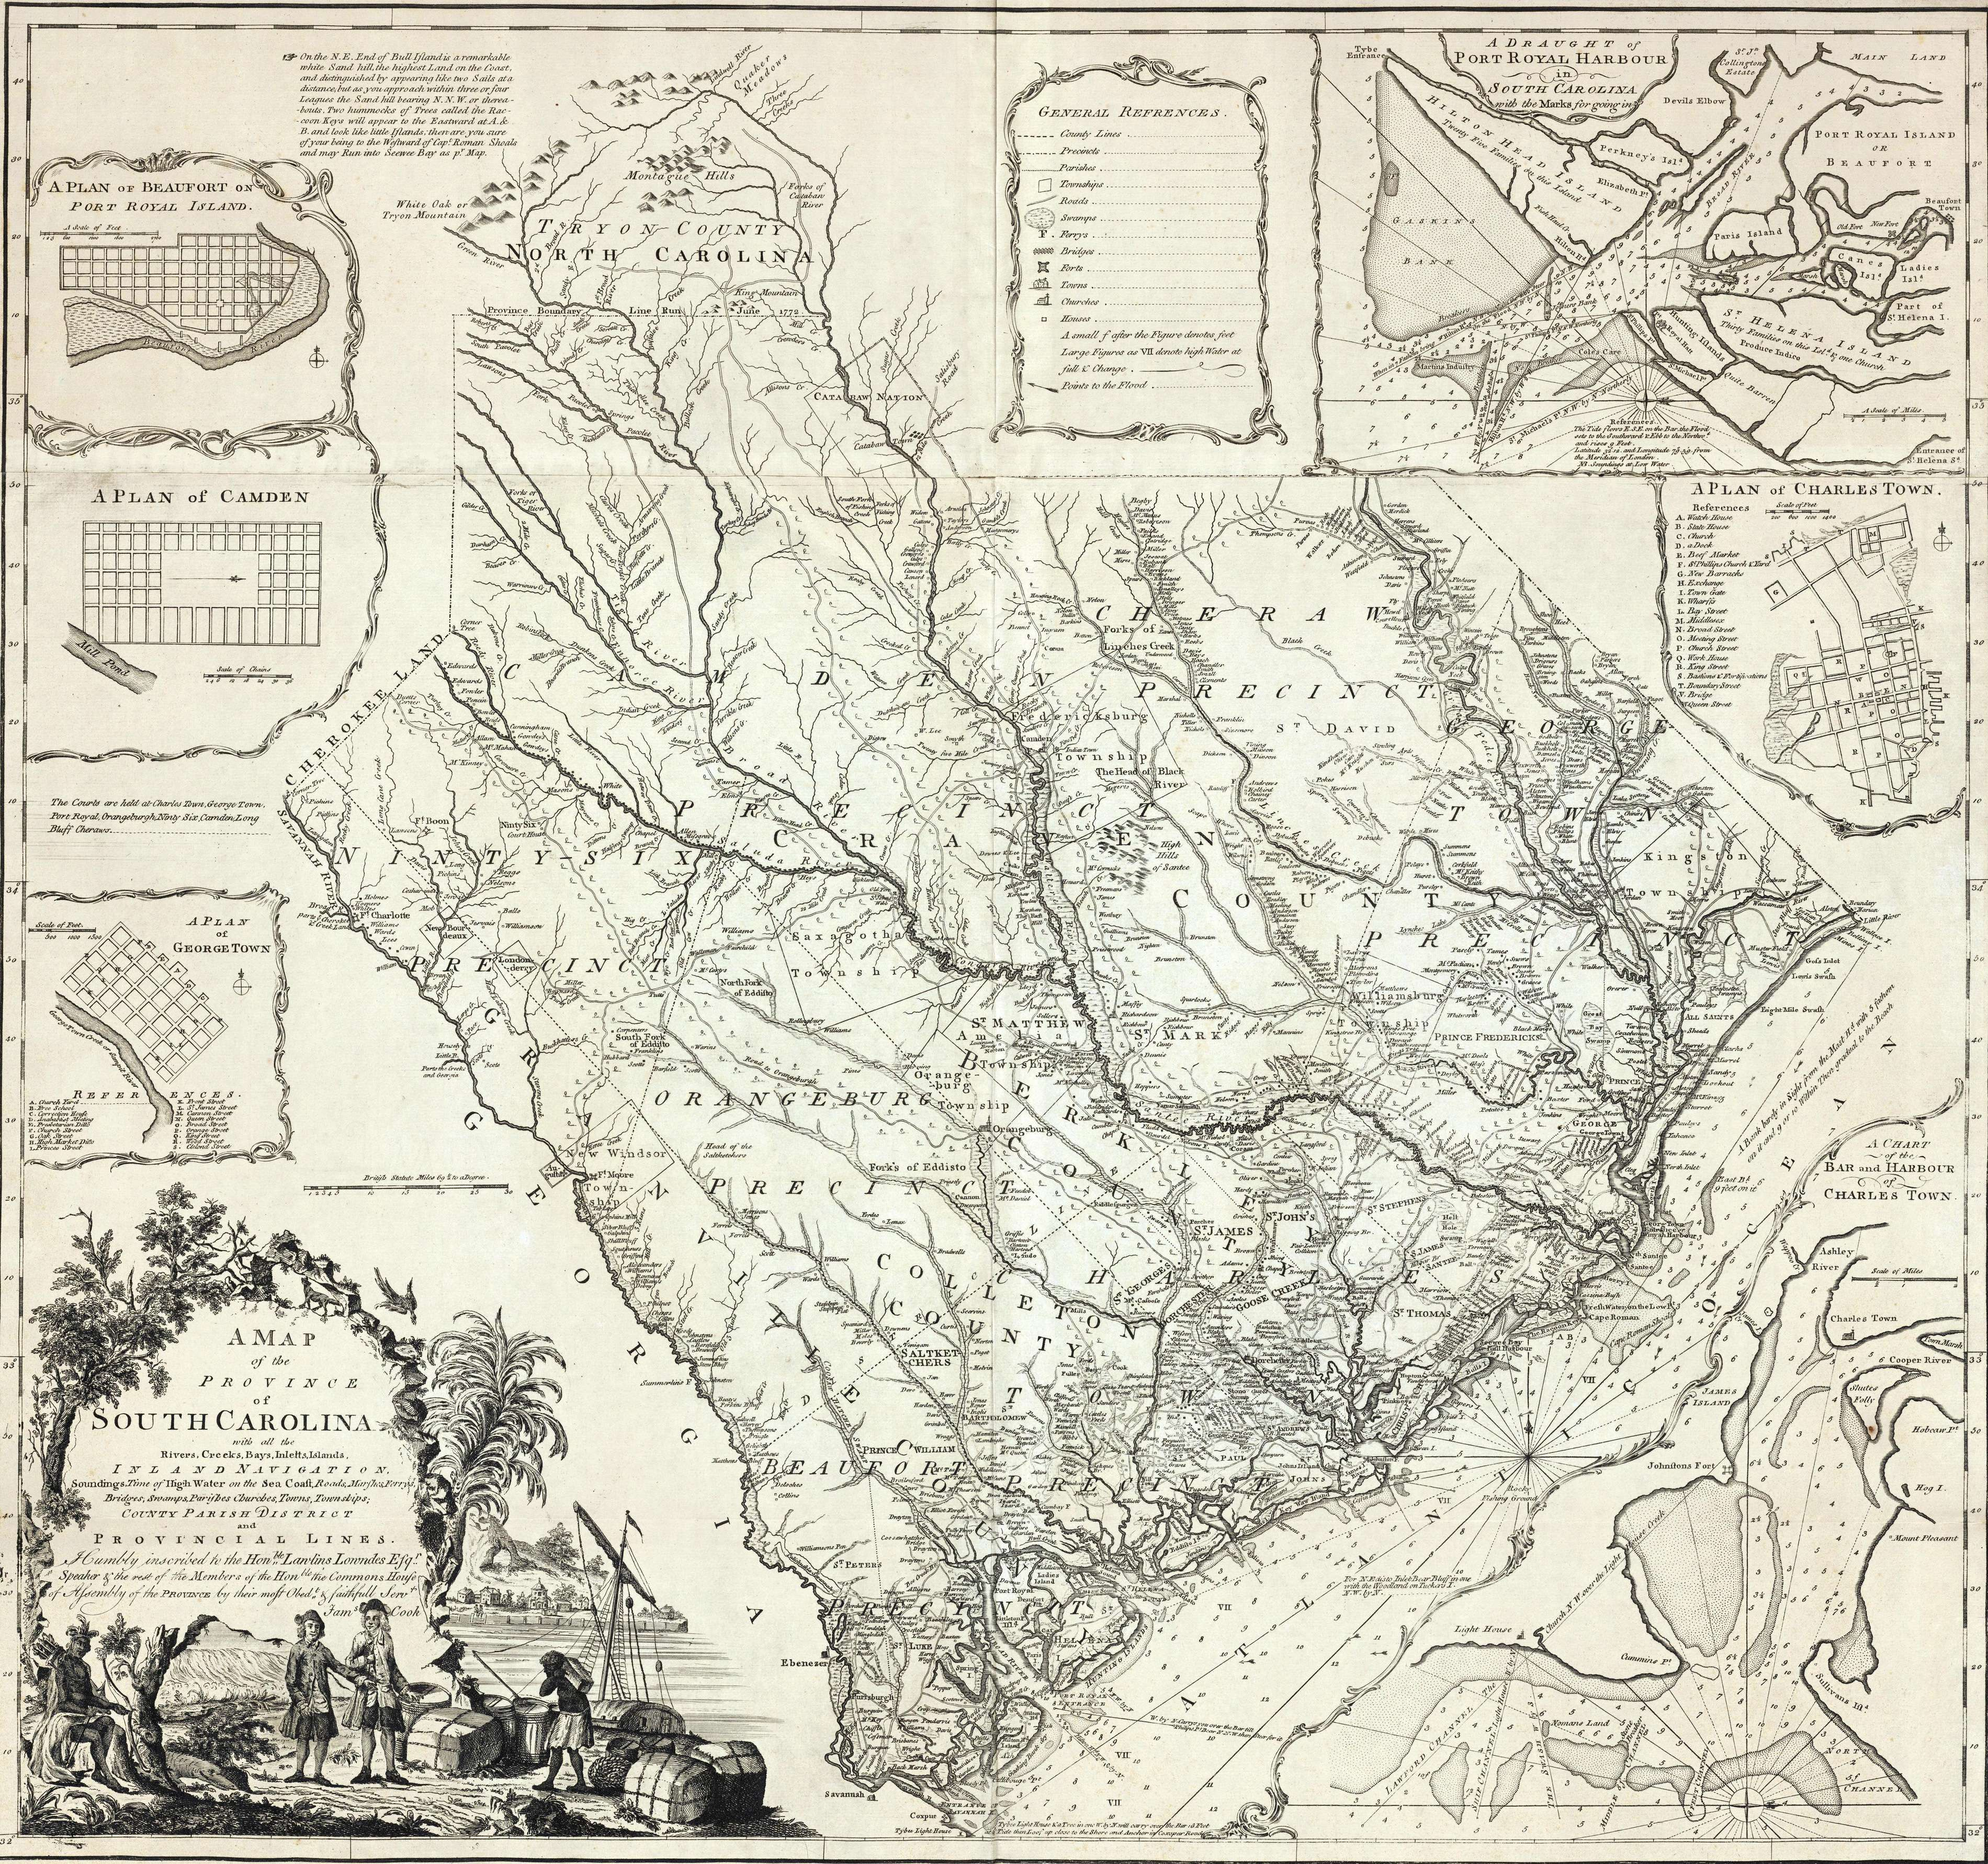 South Carolina Historical Maps Map South Carolina 1773 Historic map of South Carolina with some